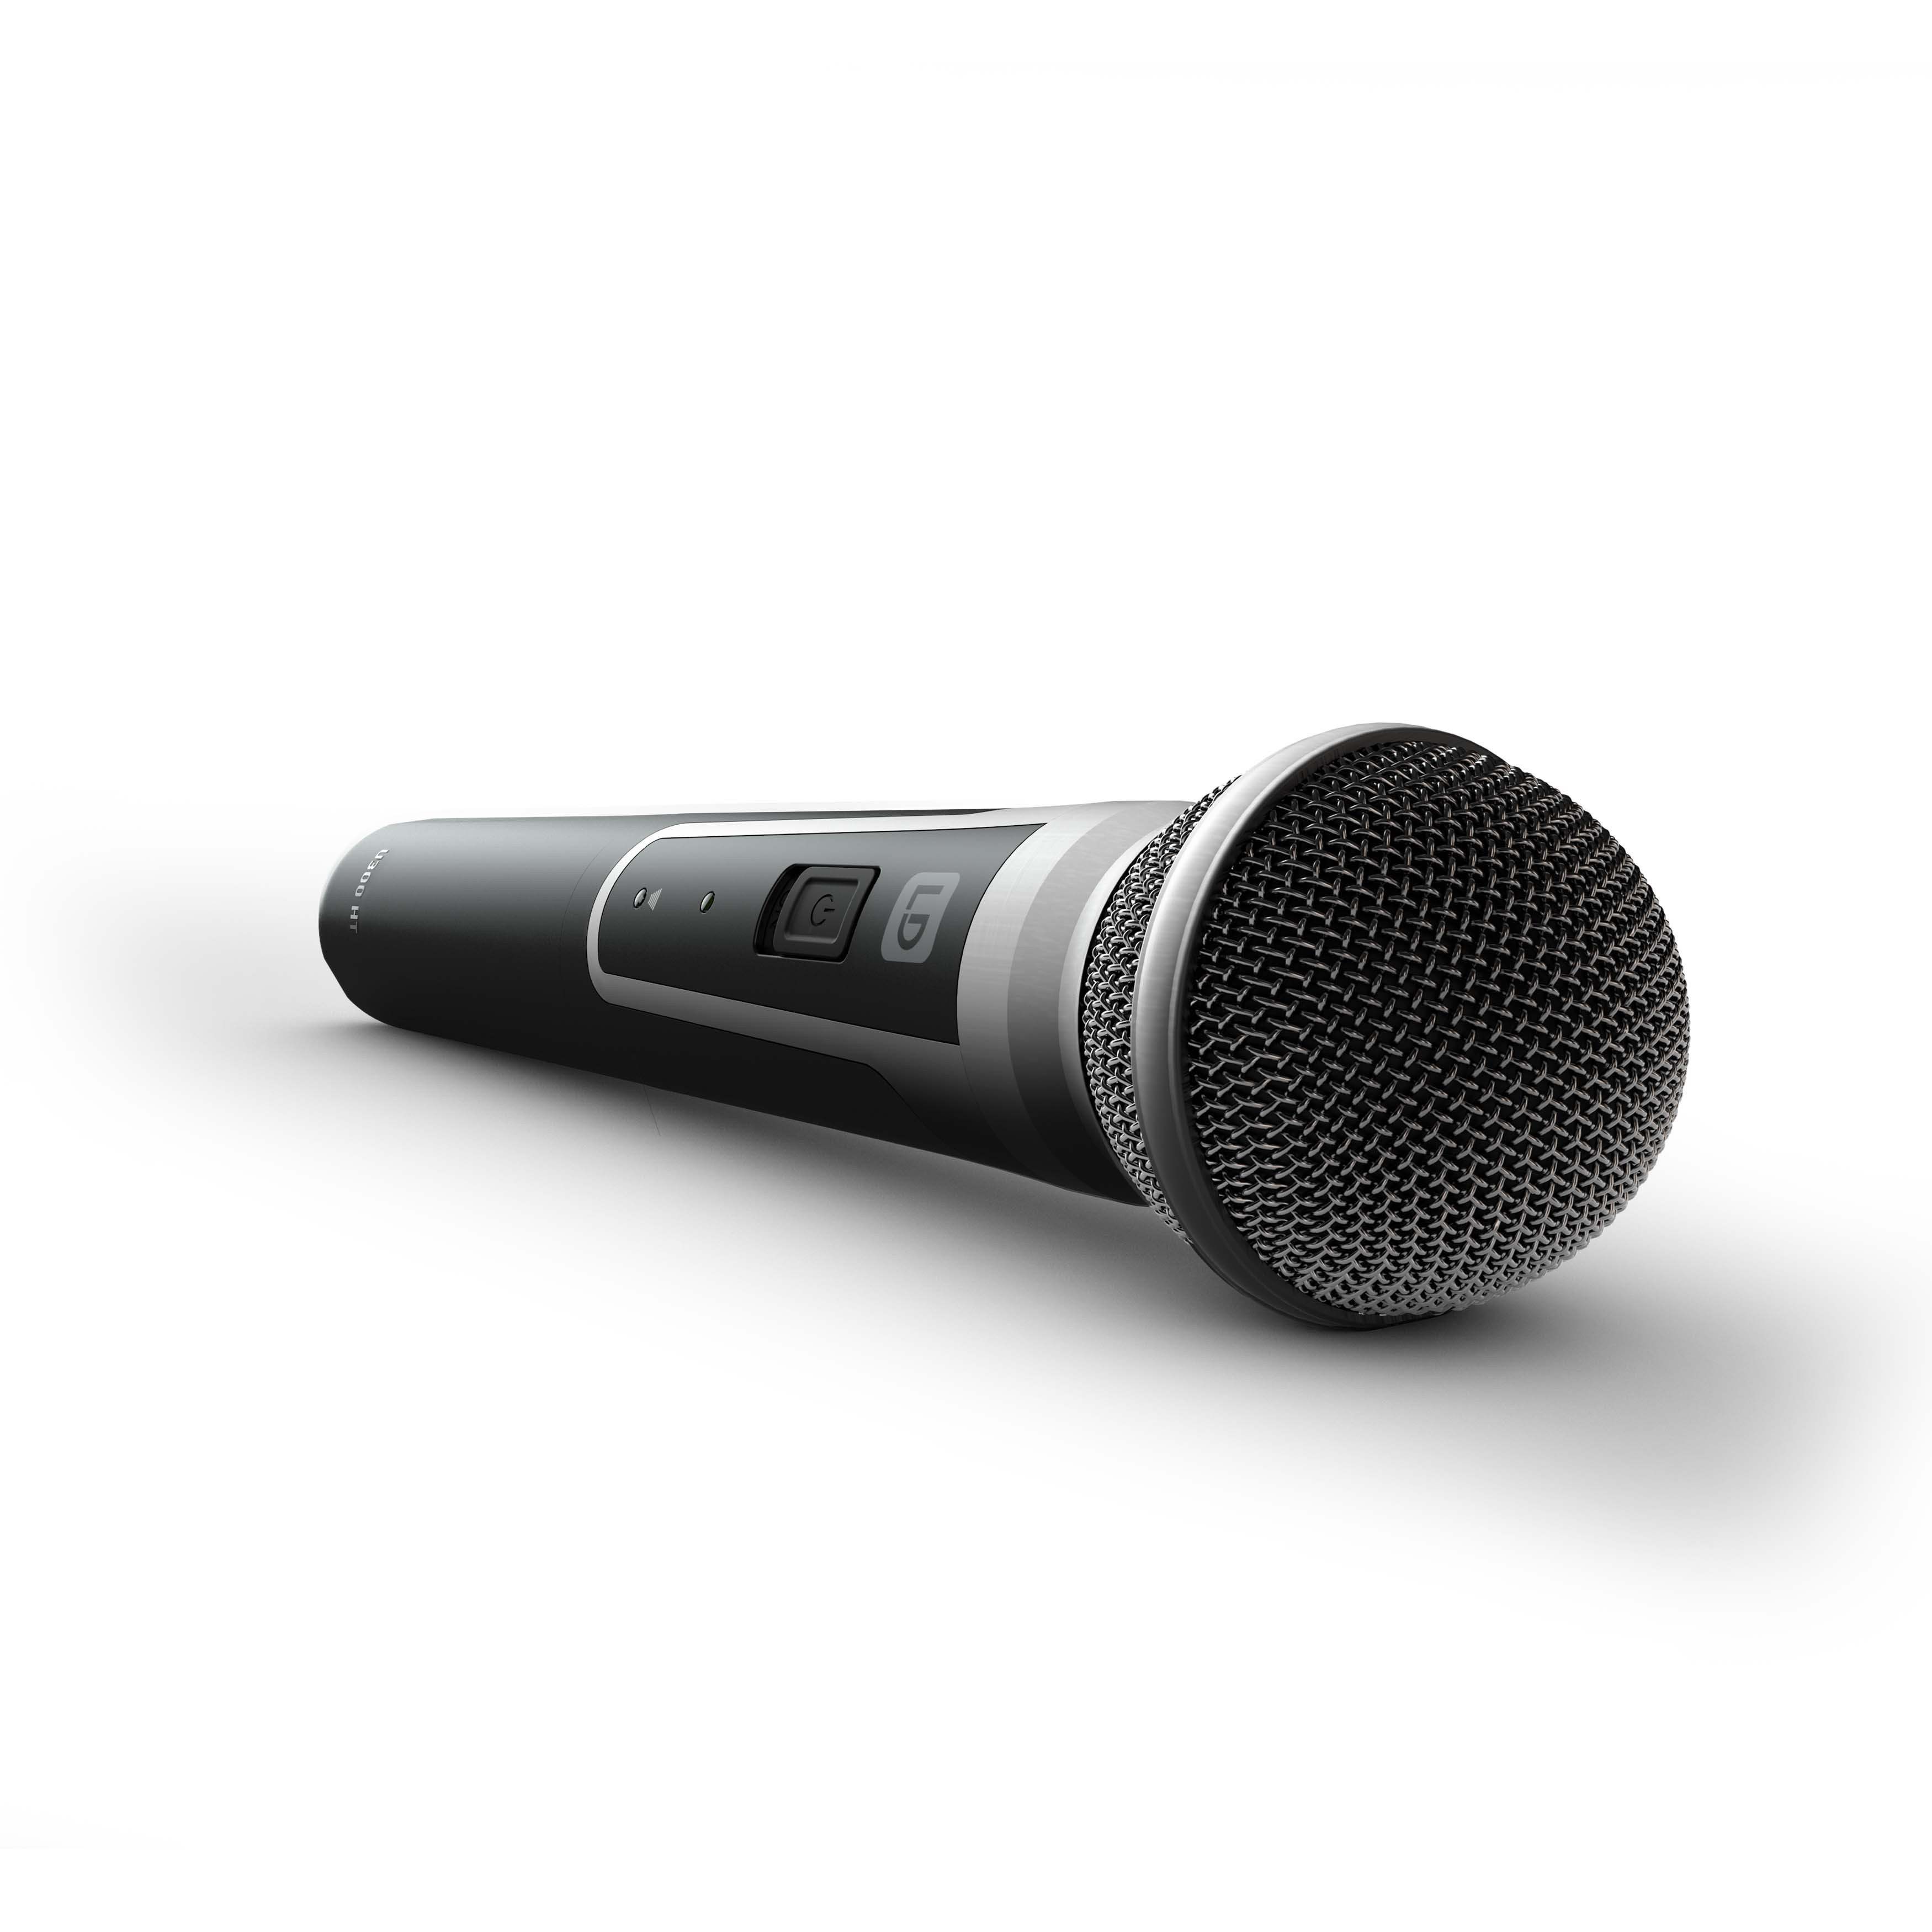 U308 MD Handmikrofon dynamisch